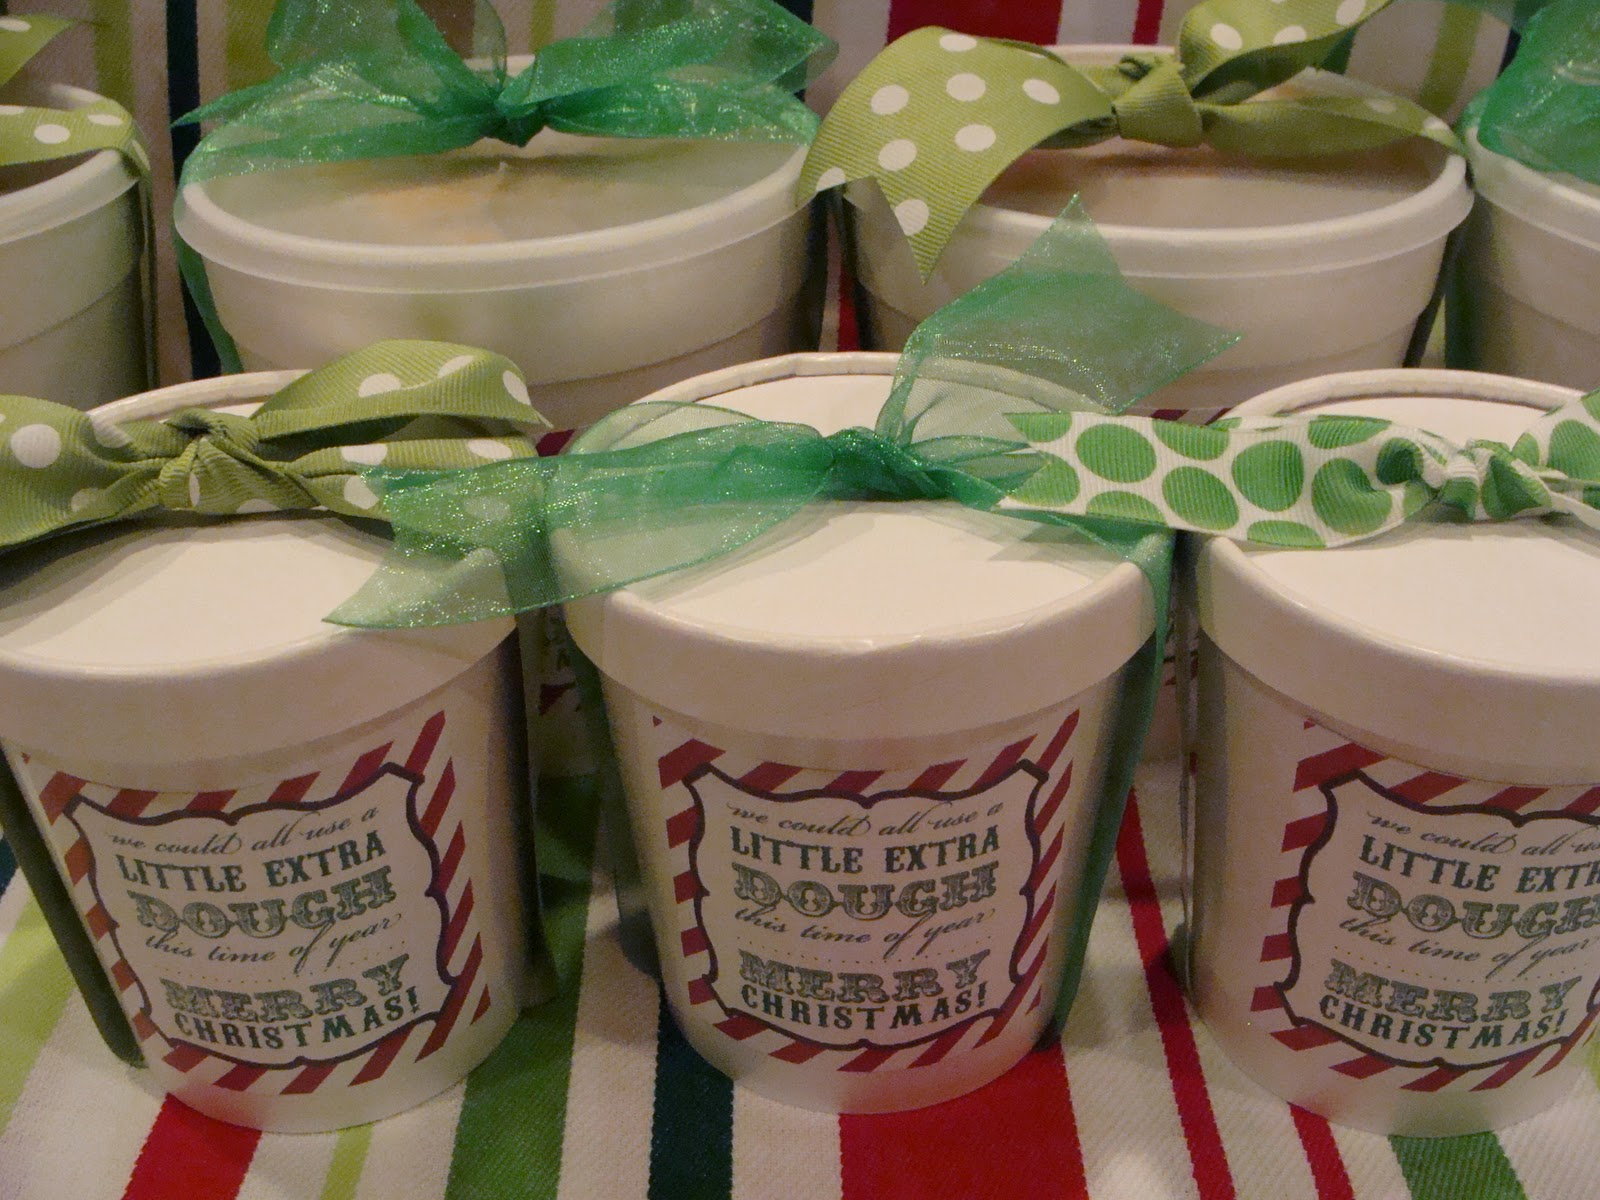 Marci Coombs: Christmas 'Neighbor' Gifts